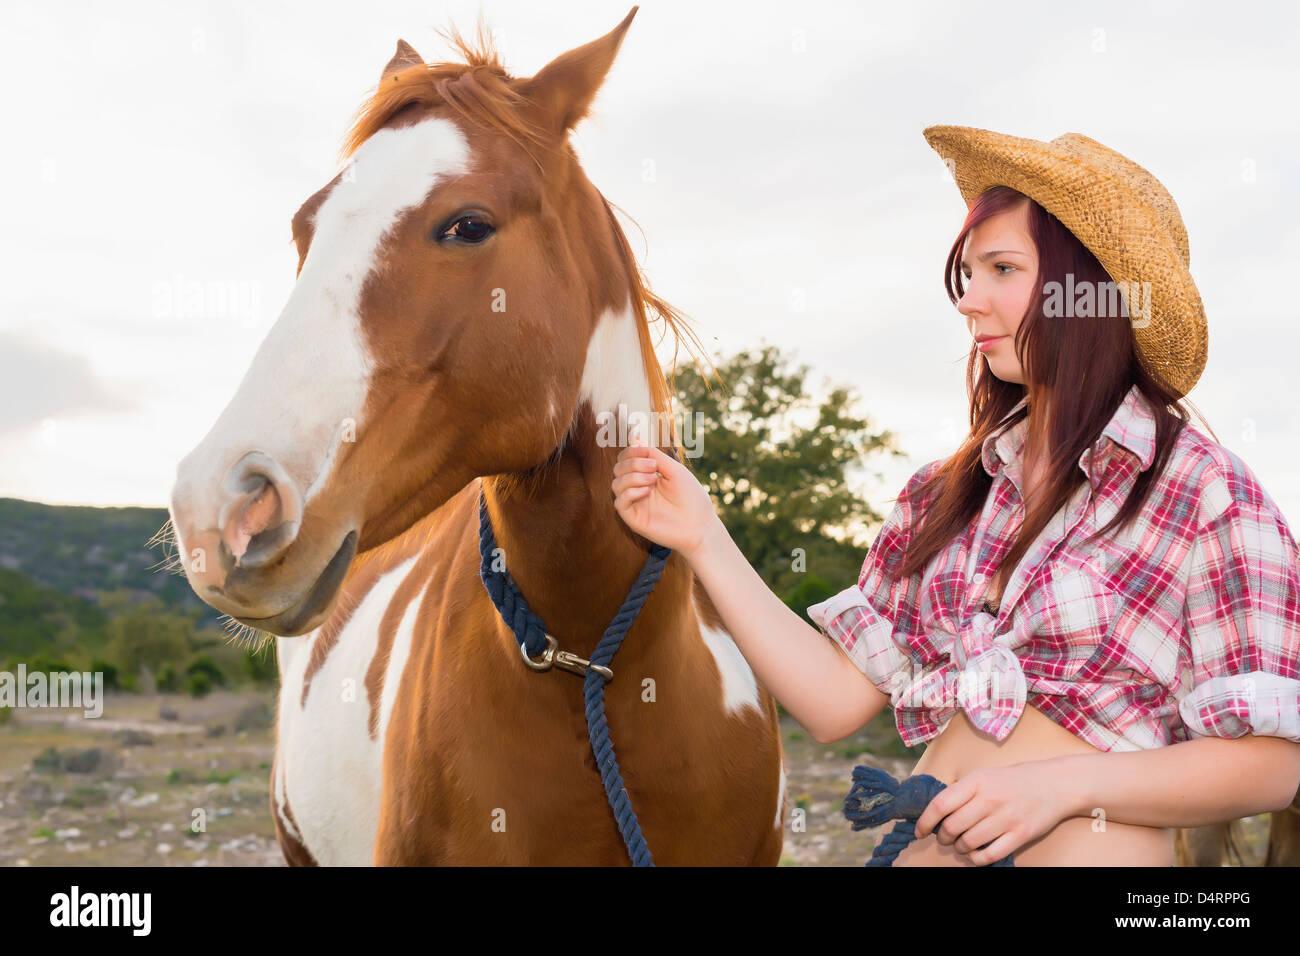 Adolescente femenino acariciar un caballo, Mujeres 19 caucasian Imagen De Stock